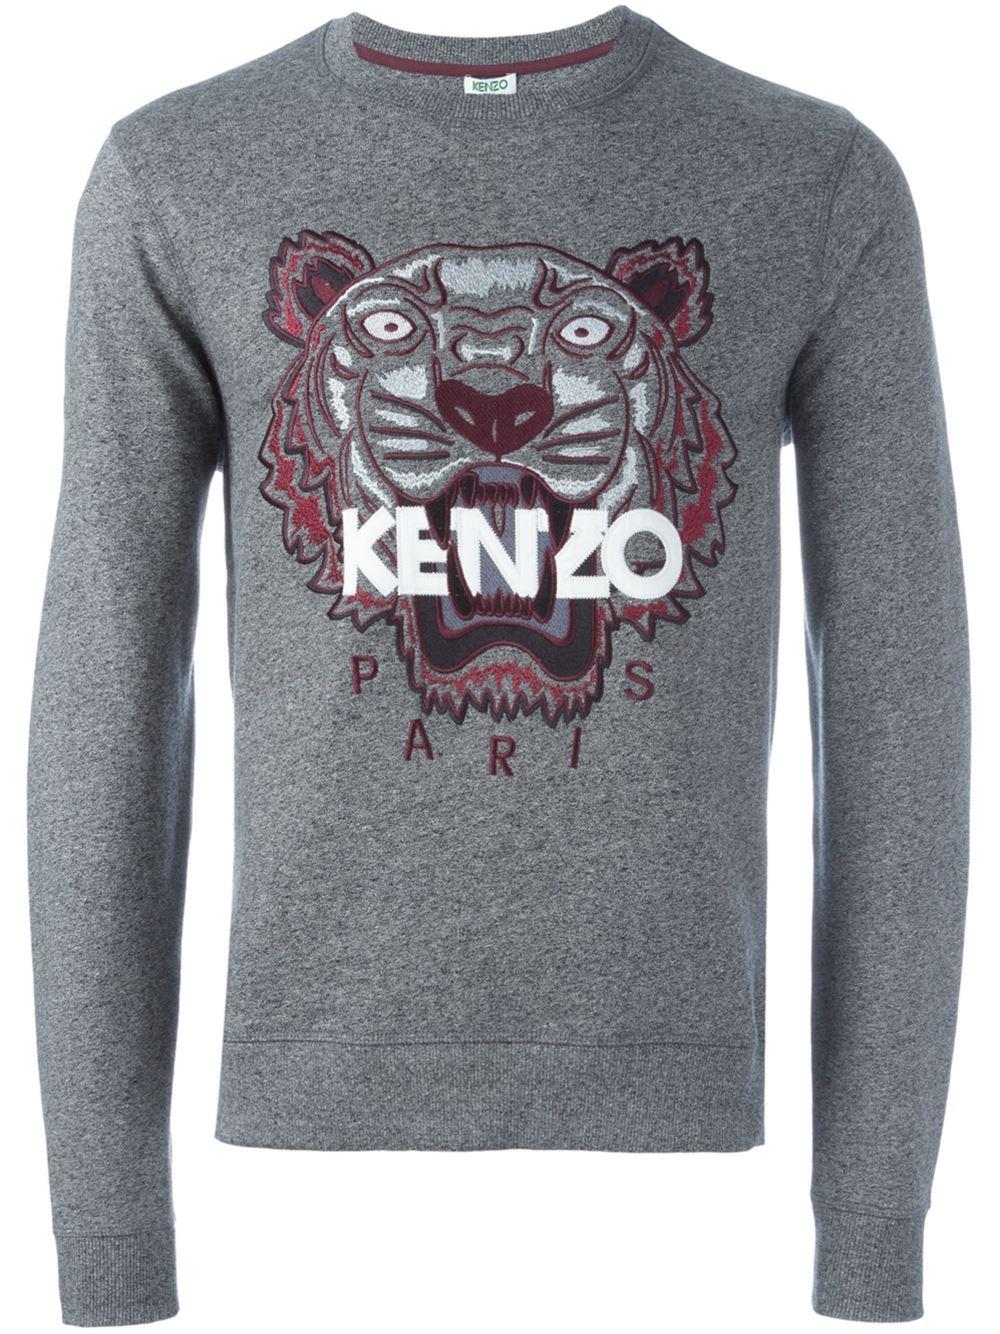 kalifornia bag cher Kenzo kenzo pas Clothing Tiger pull Homme black ZxYYqXOp adbef4b159e